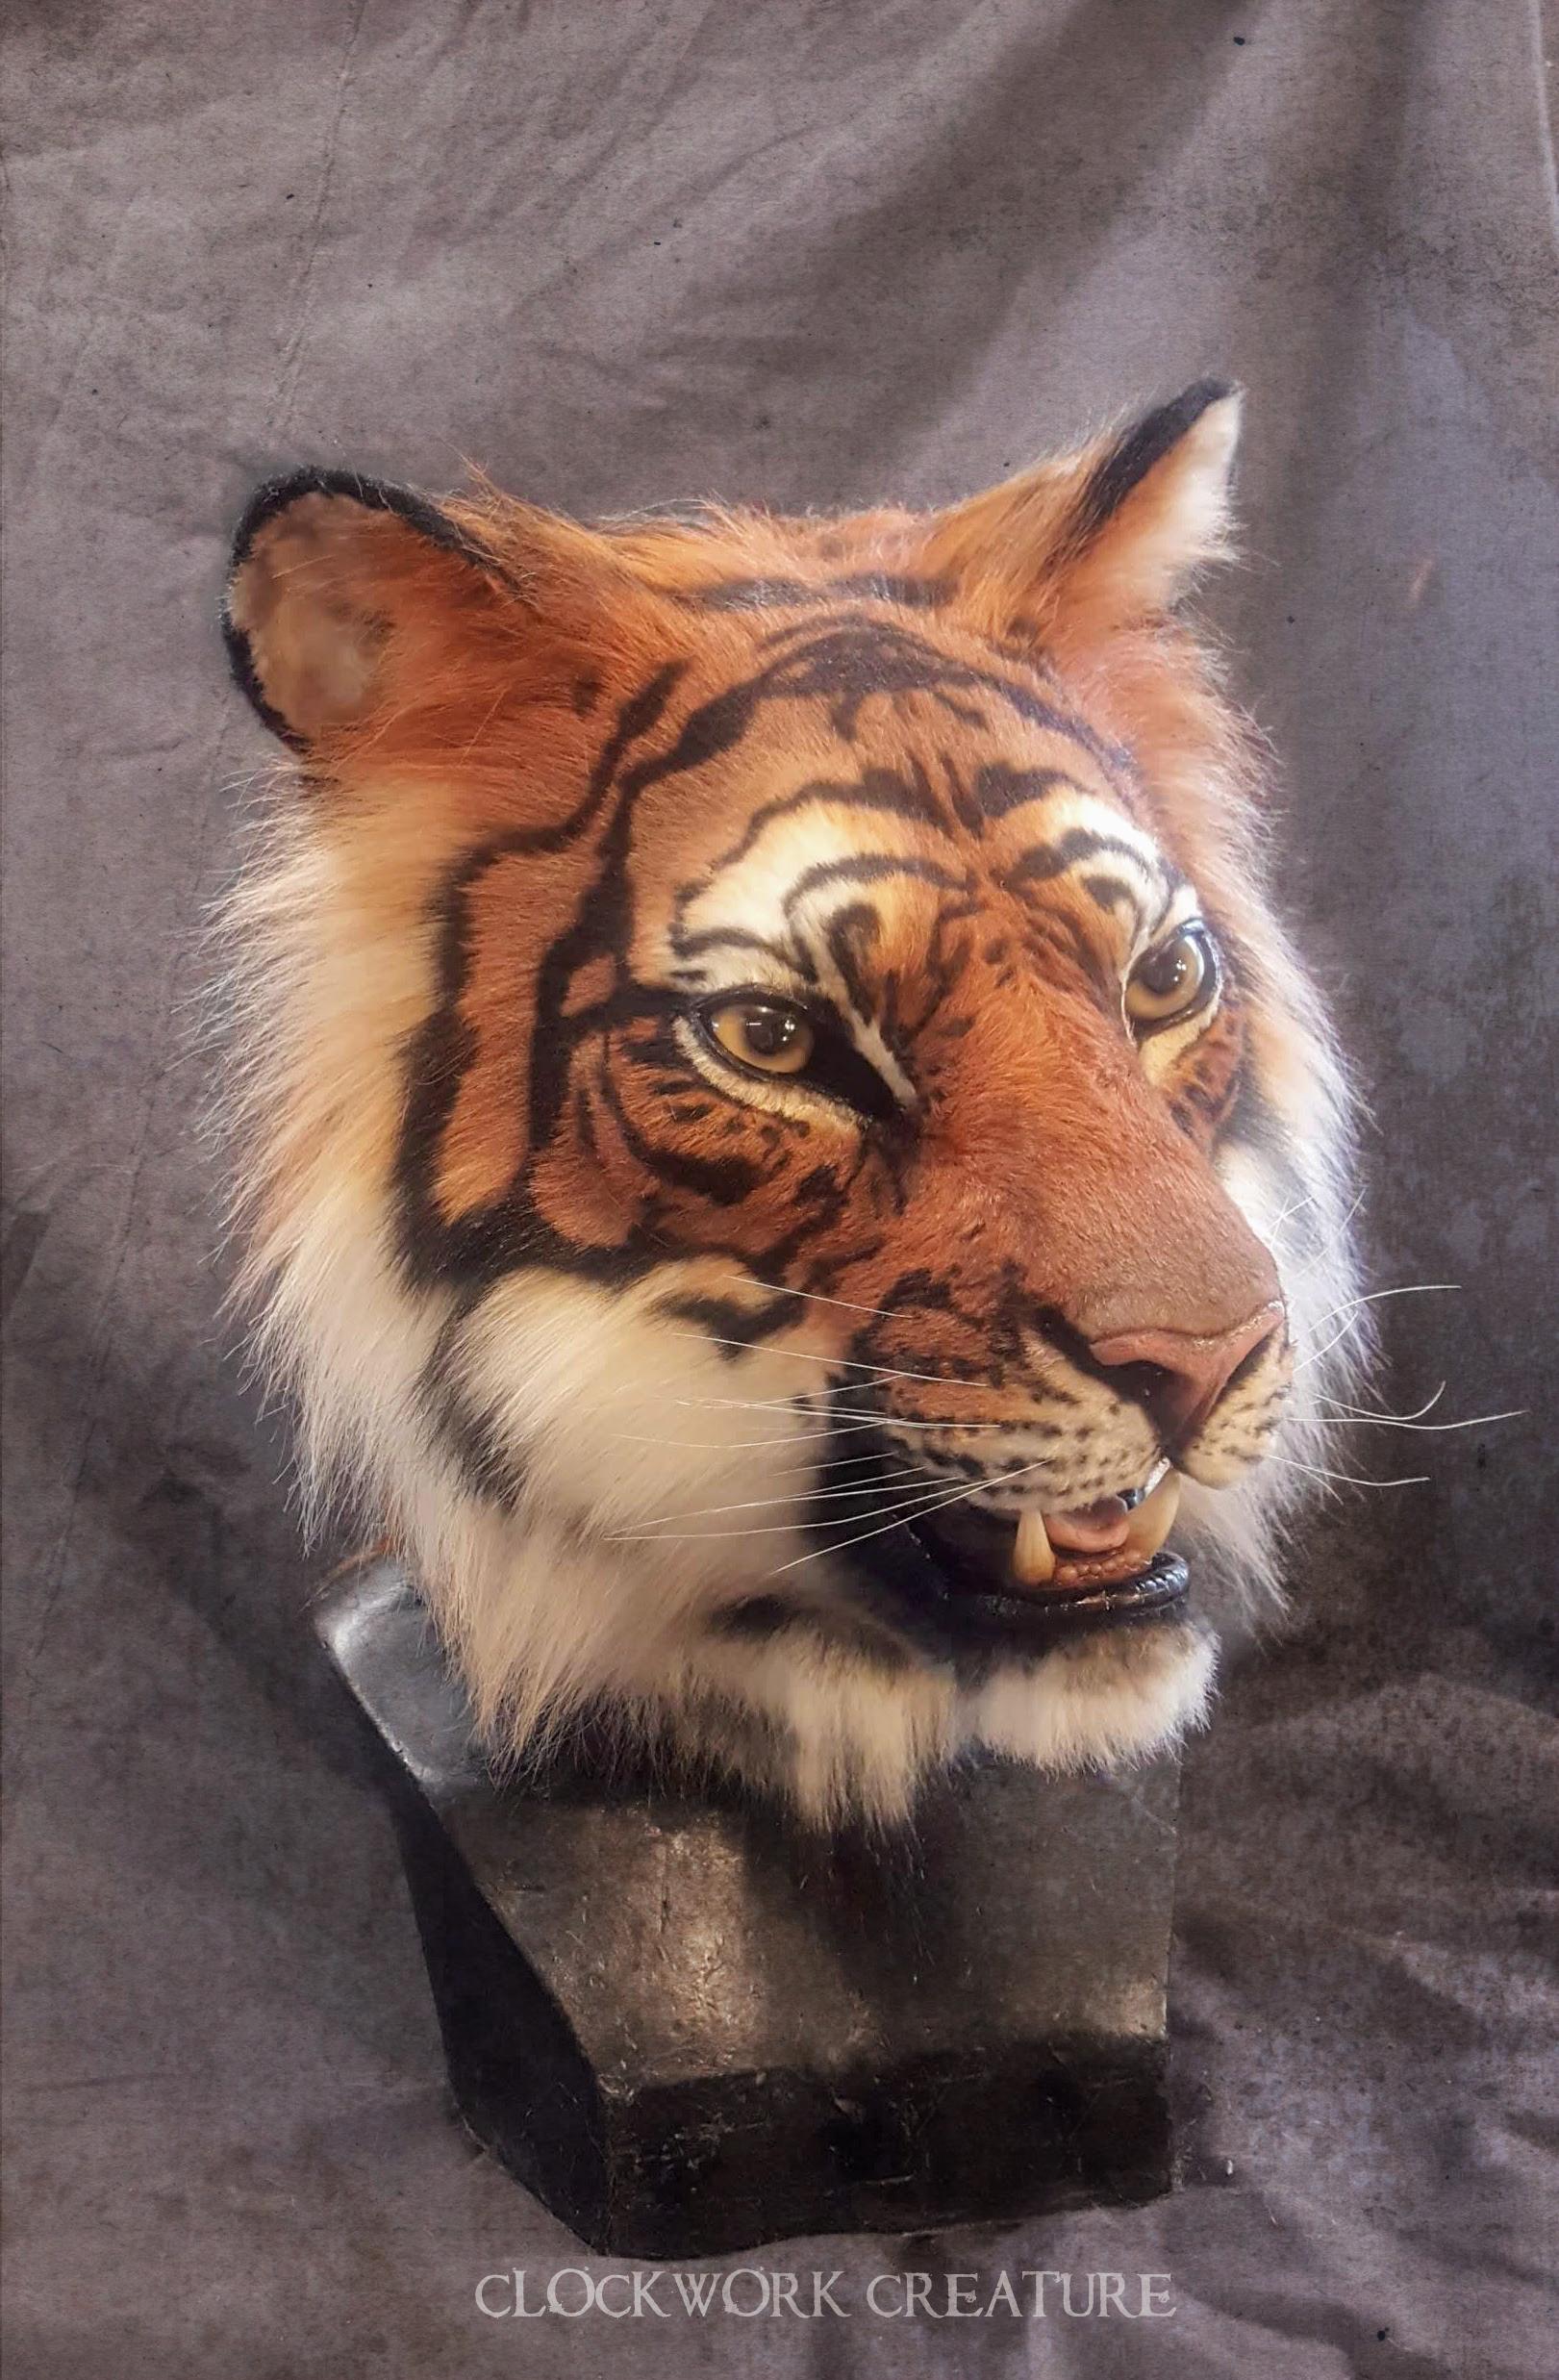 tiger5 wm.jpg